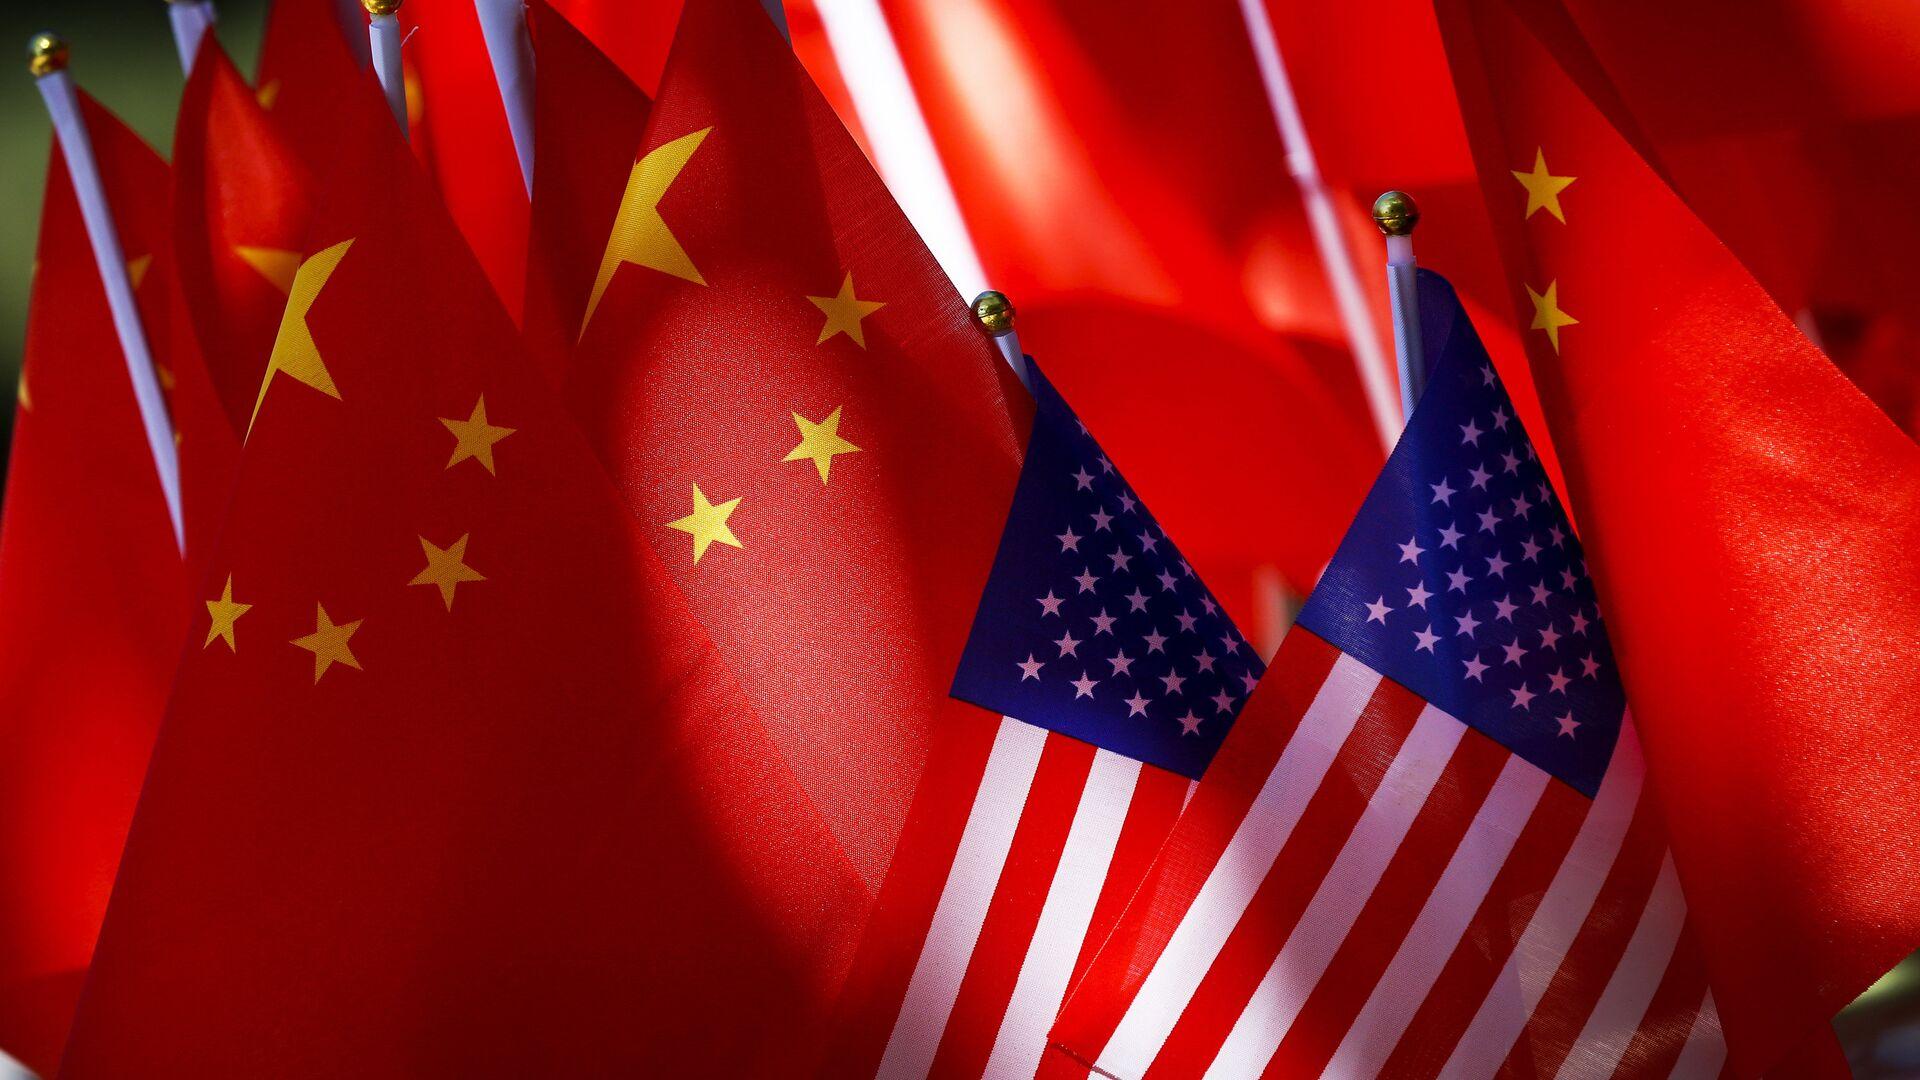 Флаги США и КНР на повозке велорикши в Пекине, Китай - РИА Новости, 1920, 08.06.2021